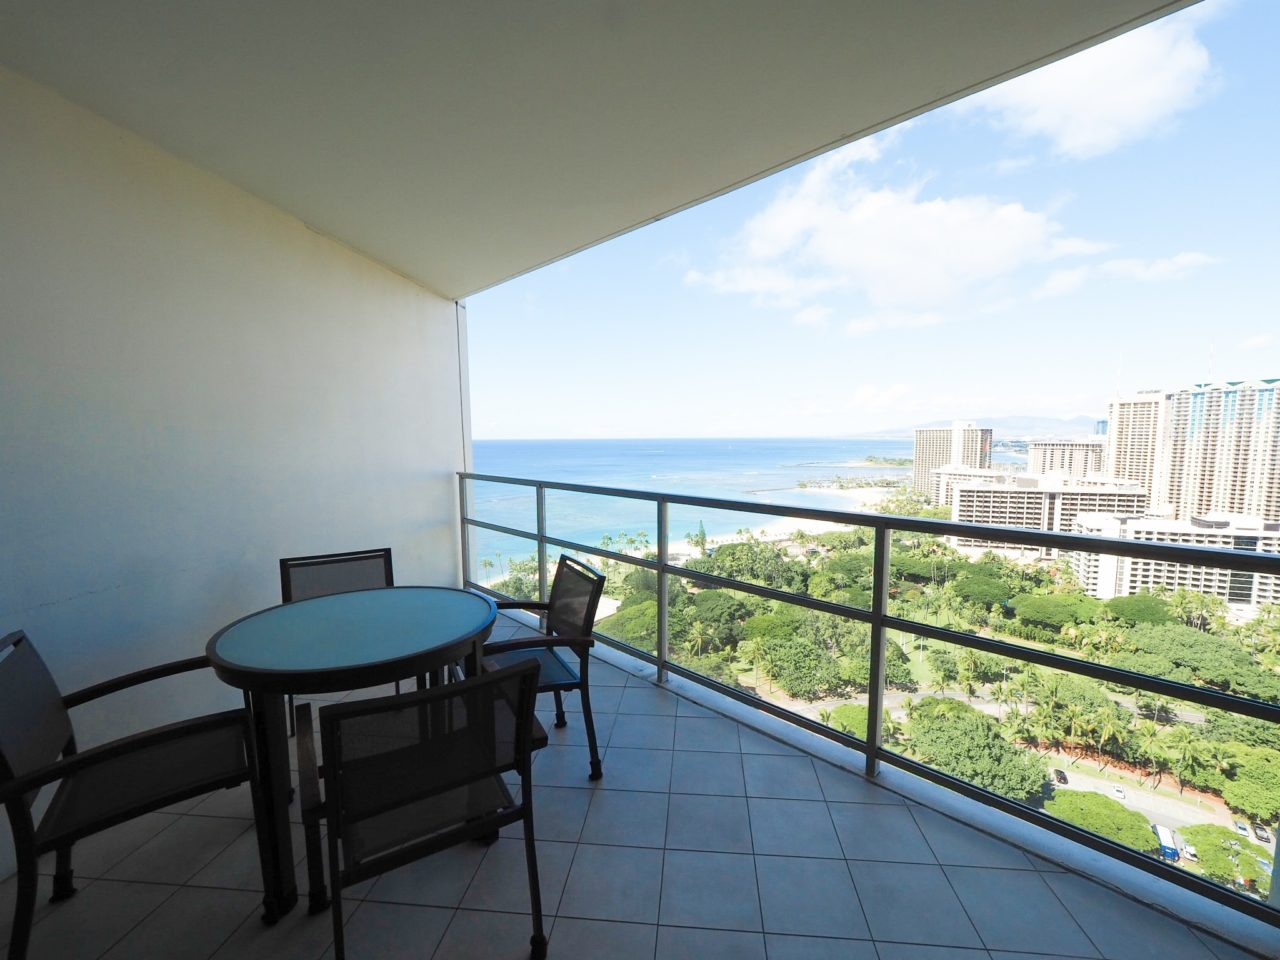 img 4899 - Trump International Hotel Waikiki - ファミリーステイに大満足!トランプ インターナショナル ホテルステイ